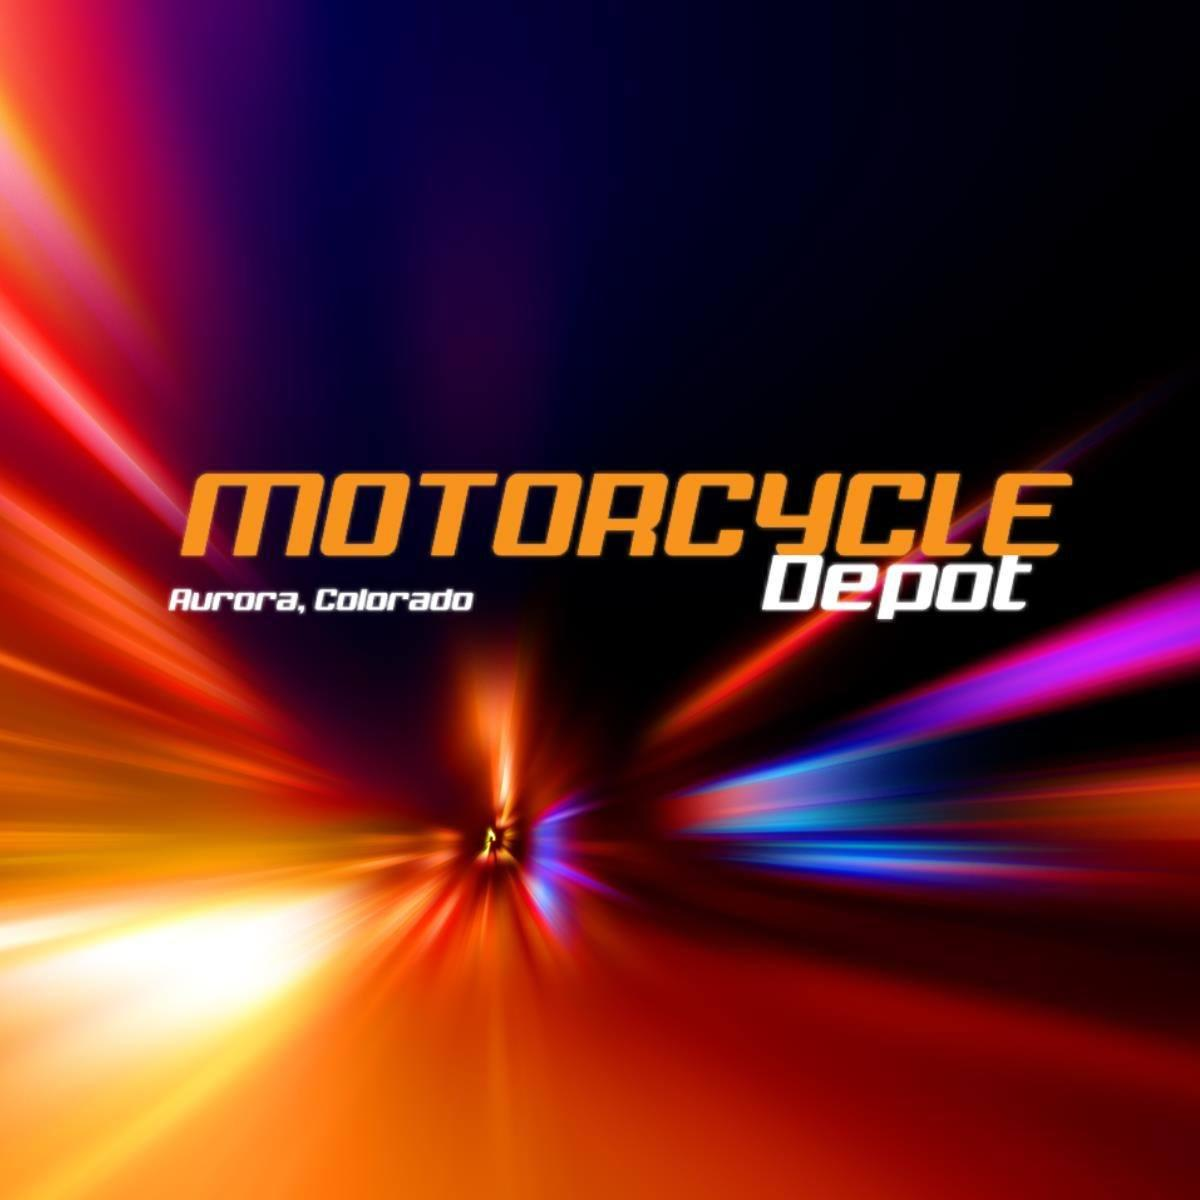 Motorcycle Depot